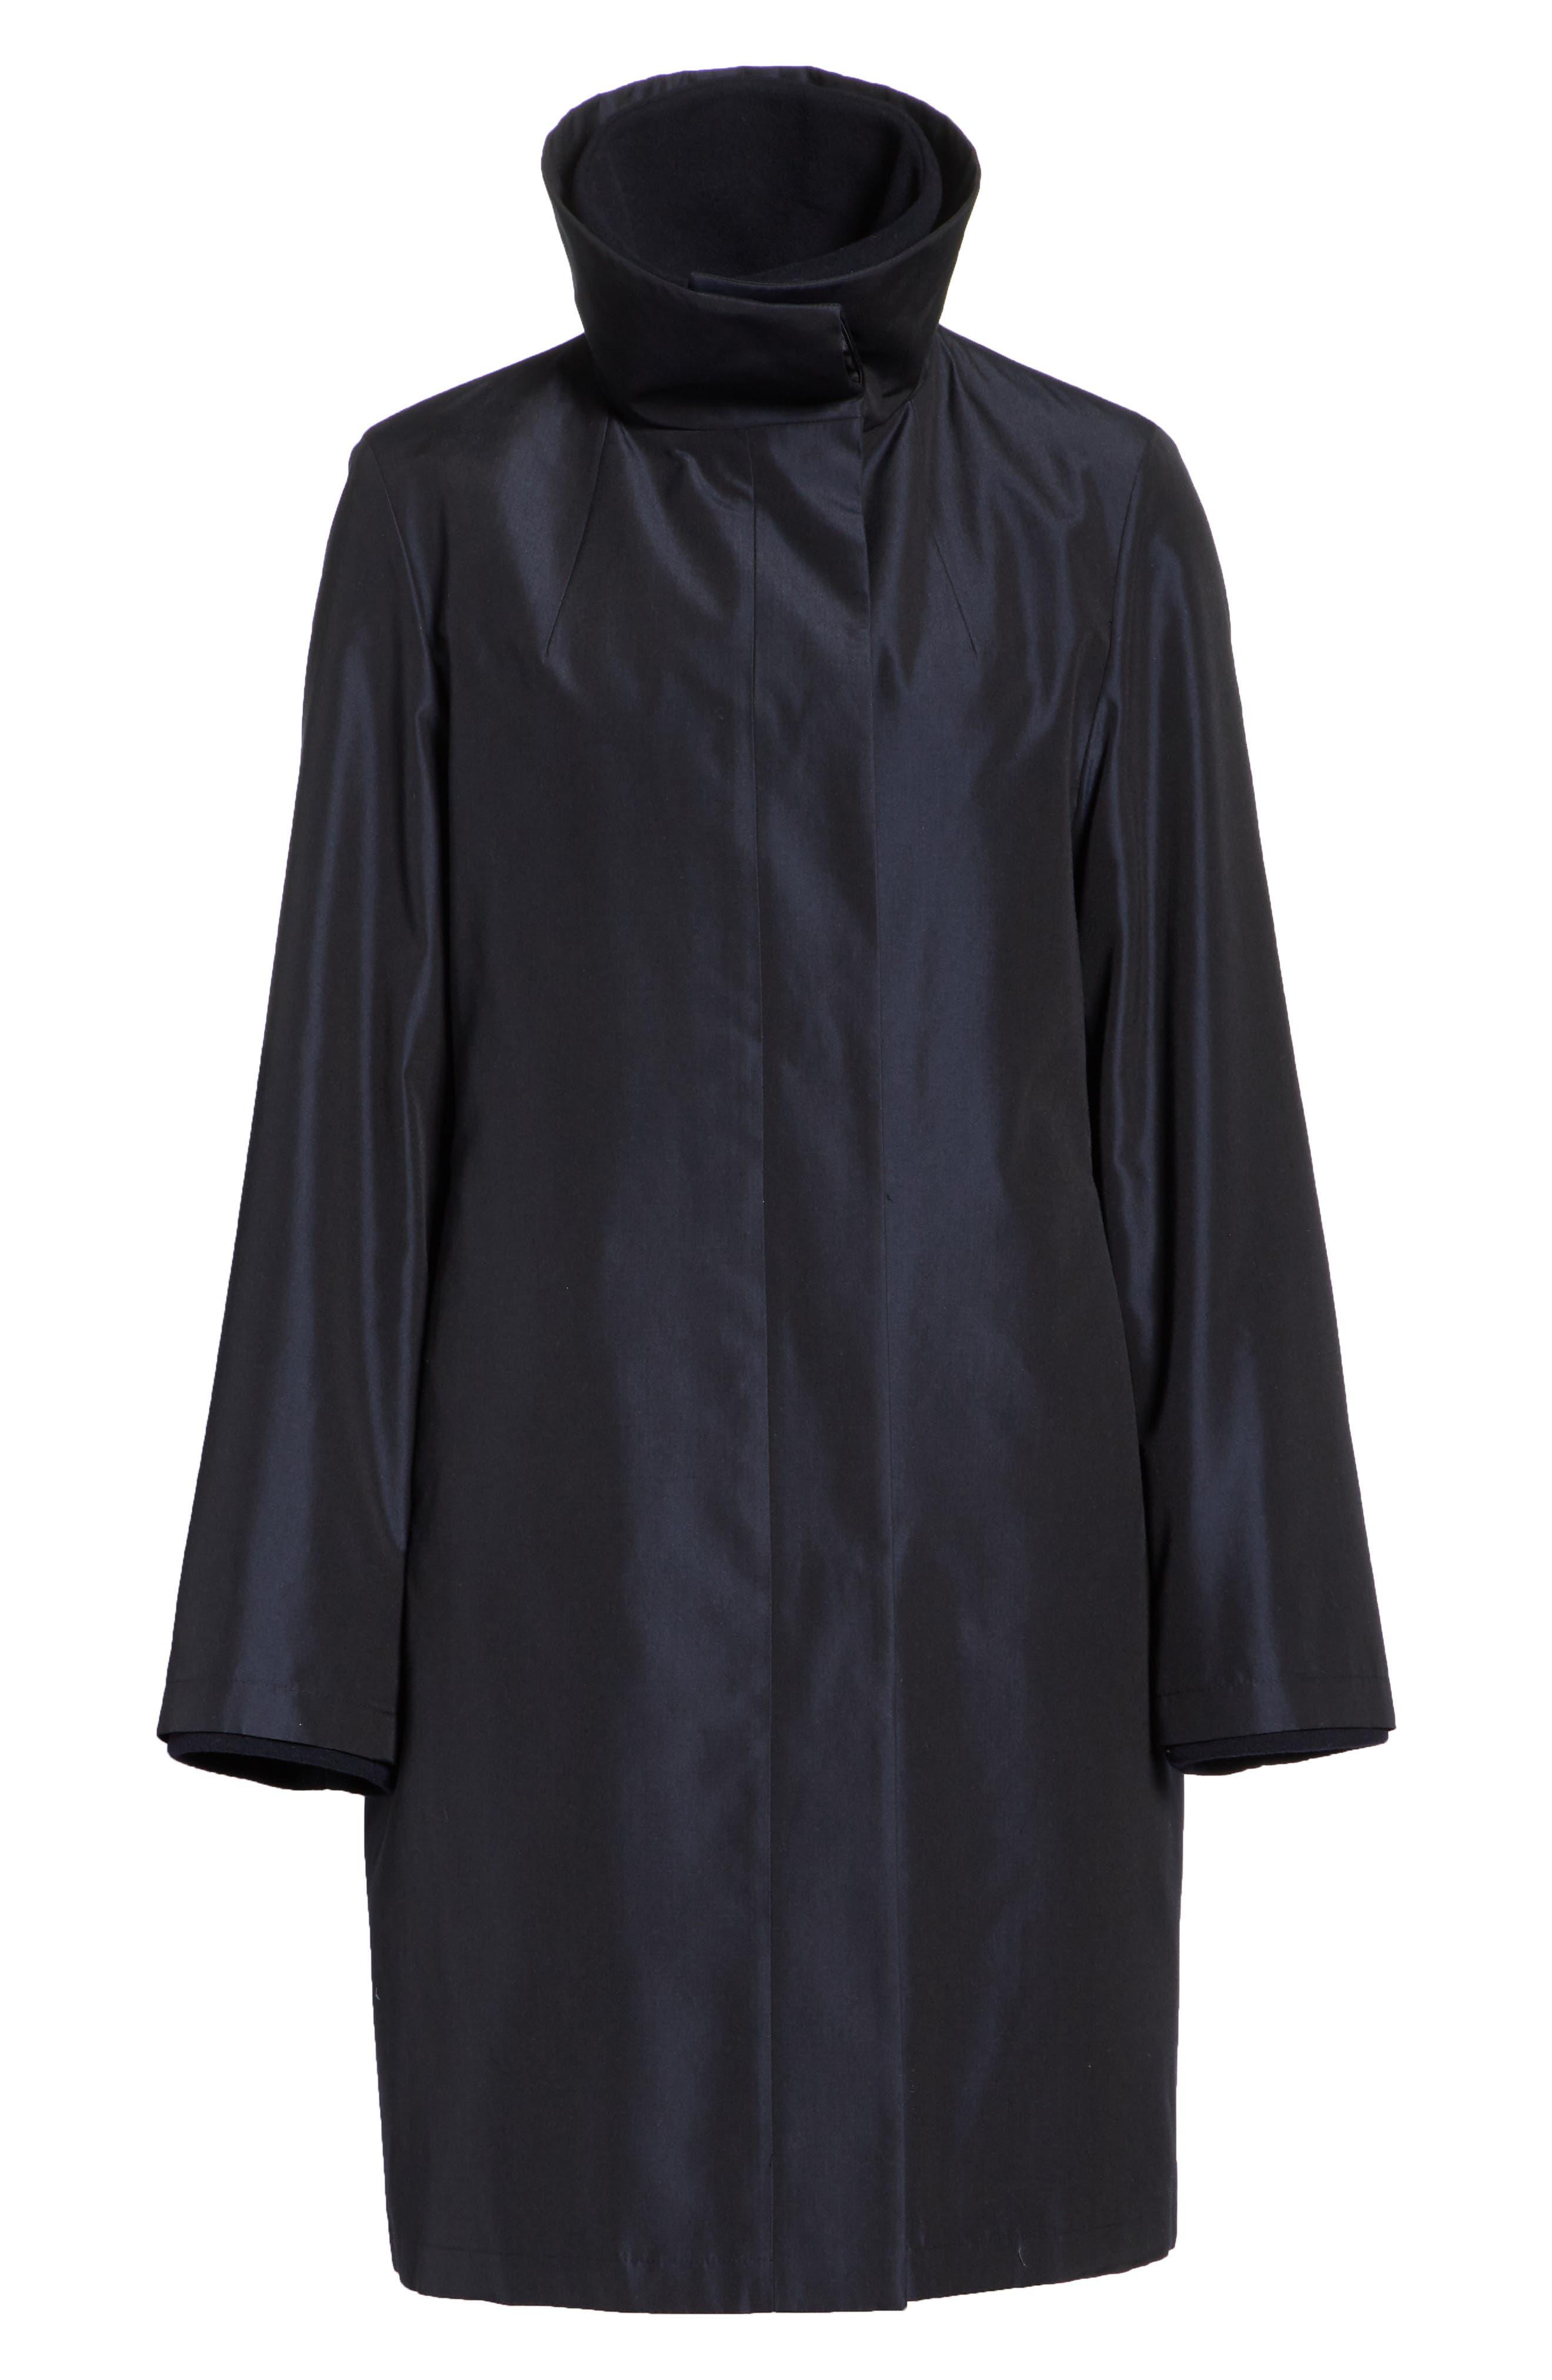 3-in-1 Technical Coat,                             Alternate thumbnail 8, color,                             BLACK